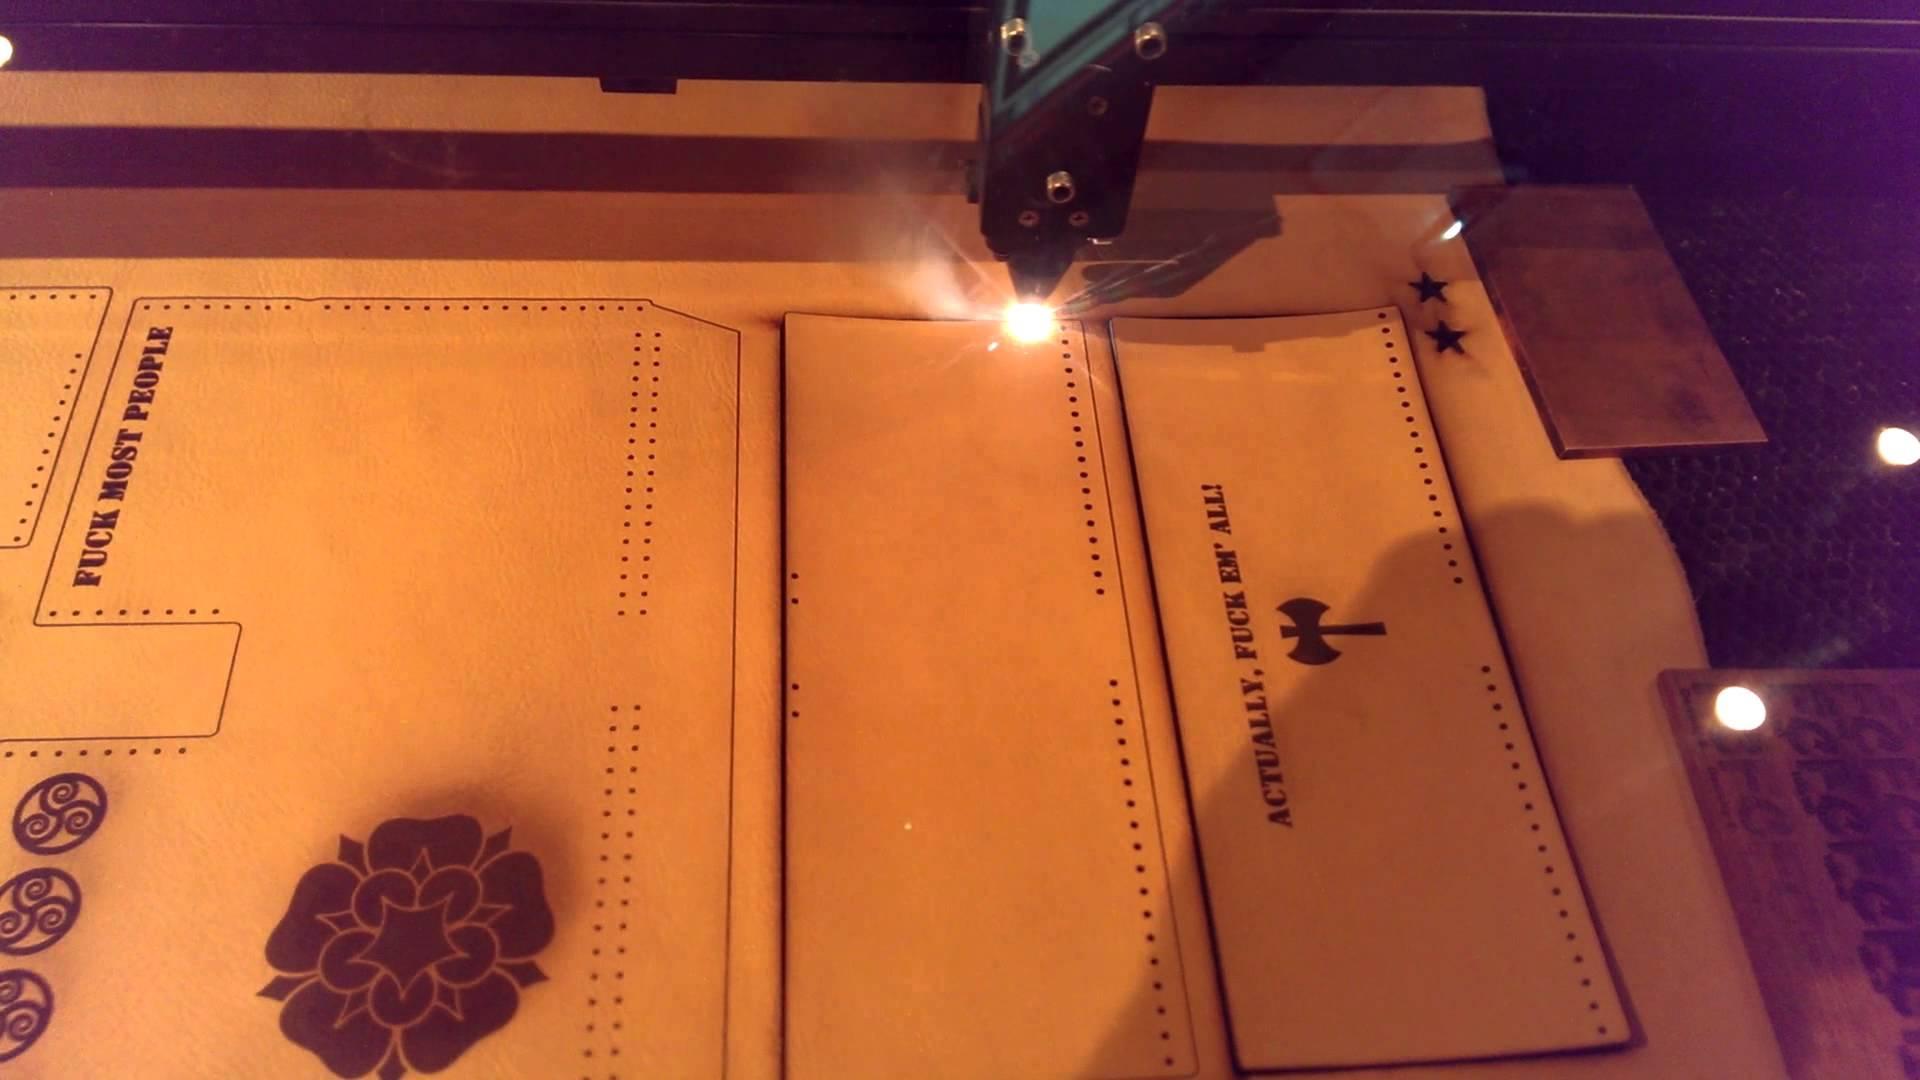 Gia công cắt laser, khắc laser vải, da, simili, giấy, mica bằng máy laser CNC